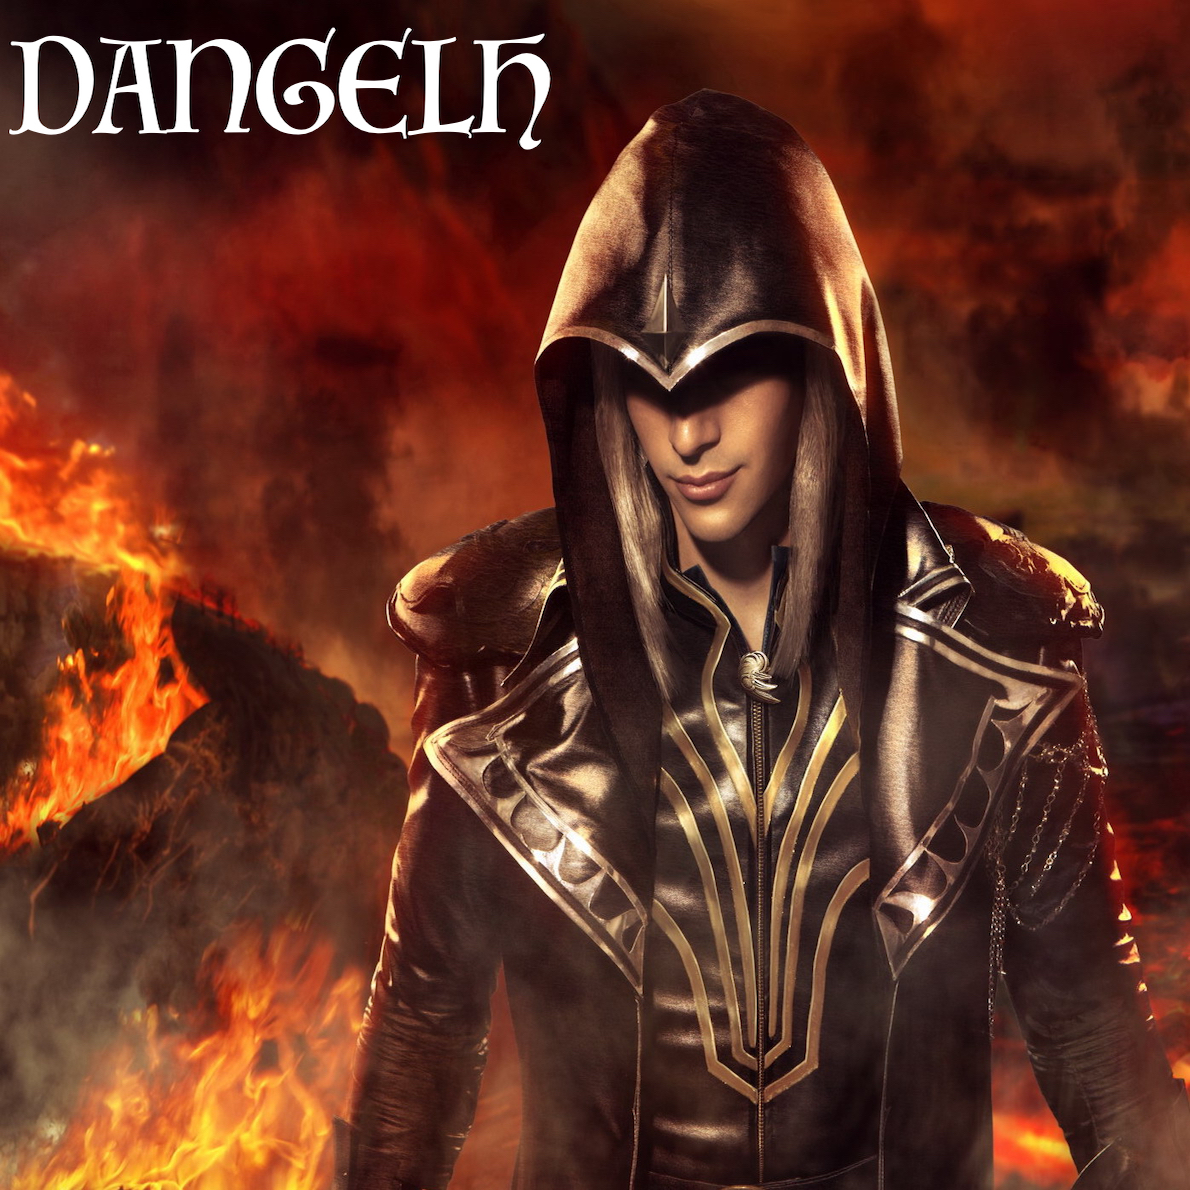 DANGELH - Your Future (Mix) (Original Mix)